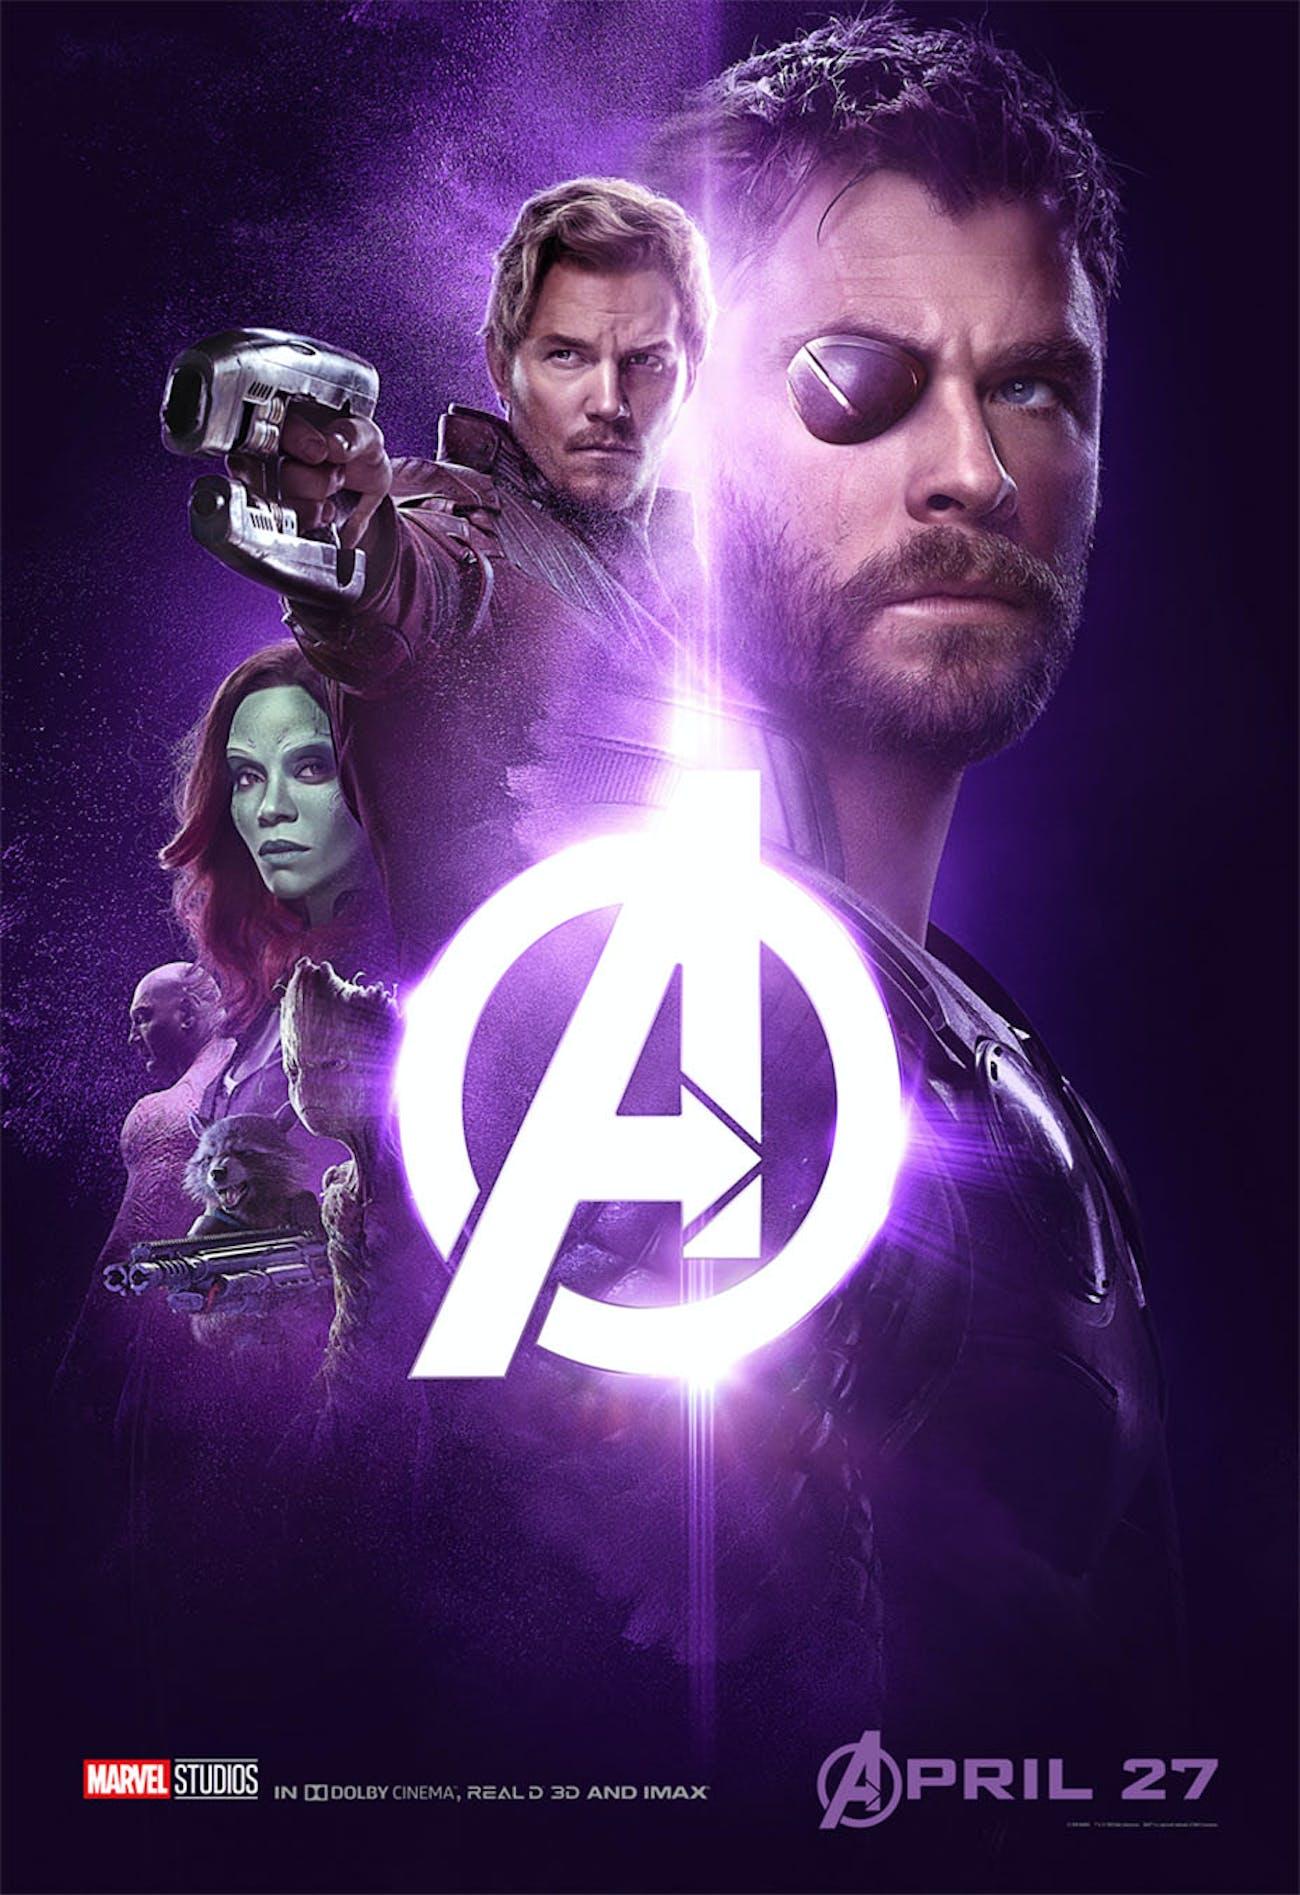 'Infinity War' poster has Thor, Star-Lord, Gamora, Drax, Rocket, and Groot.